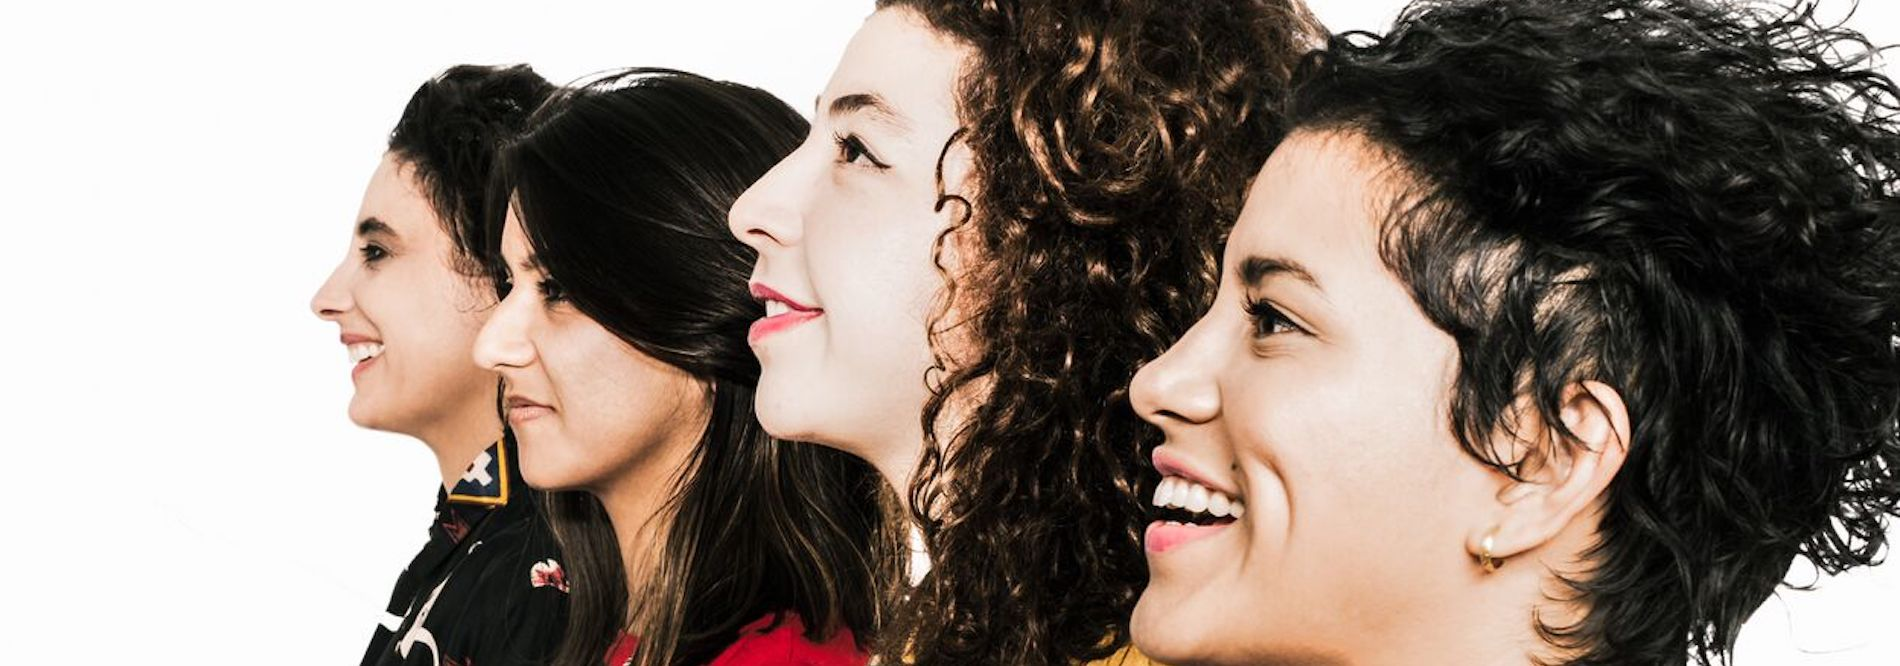 La voz del Folclor Latino